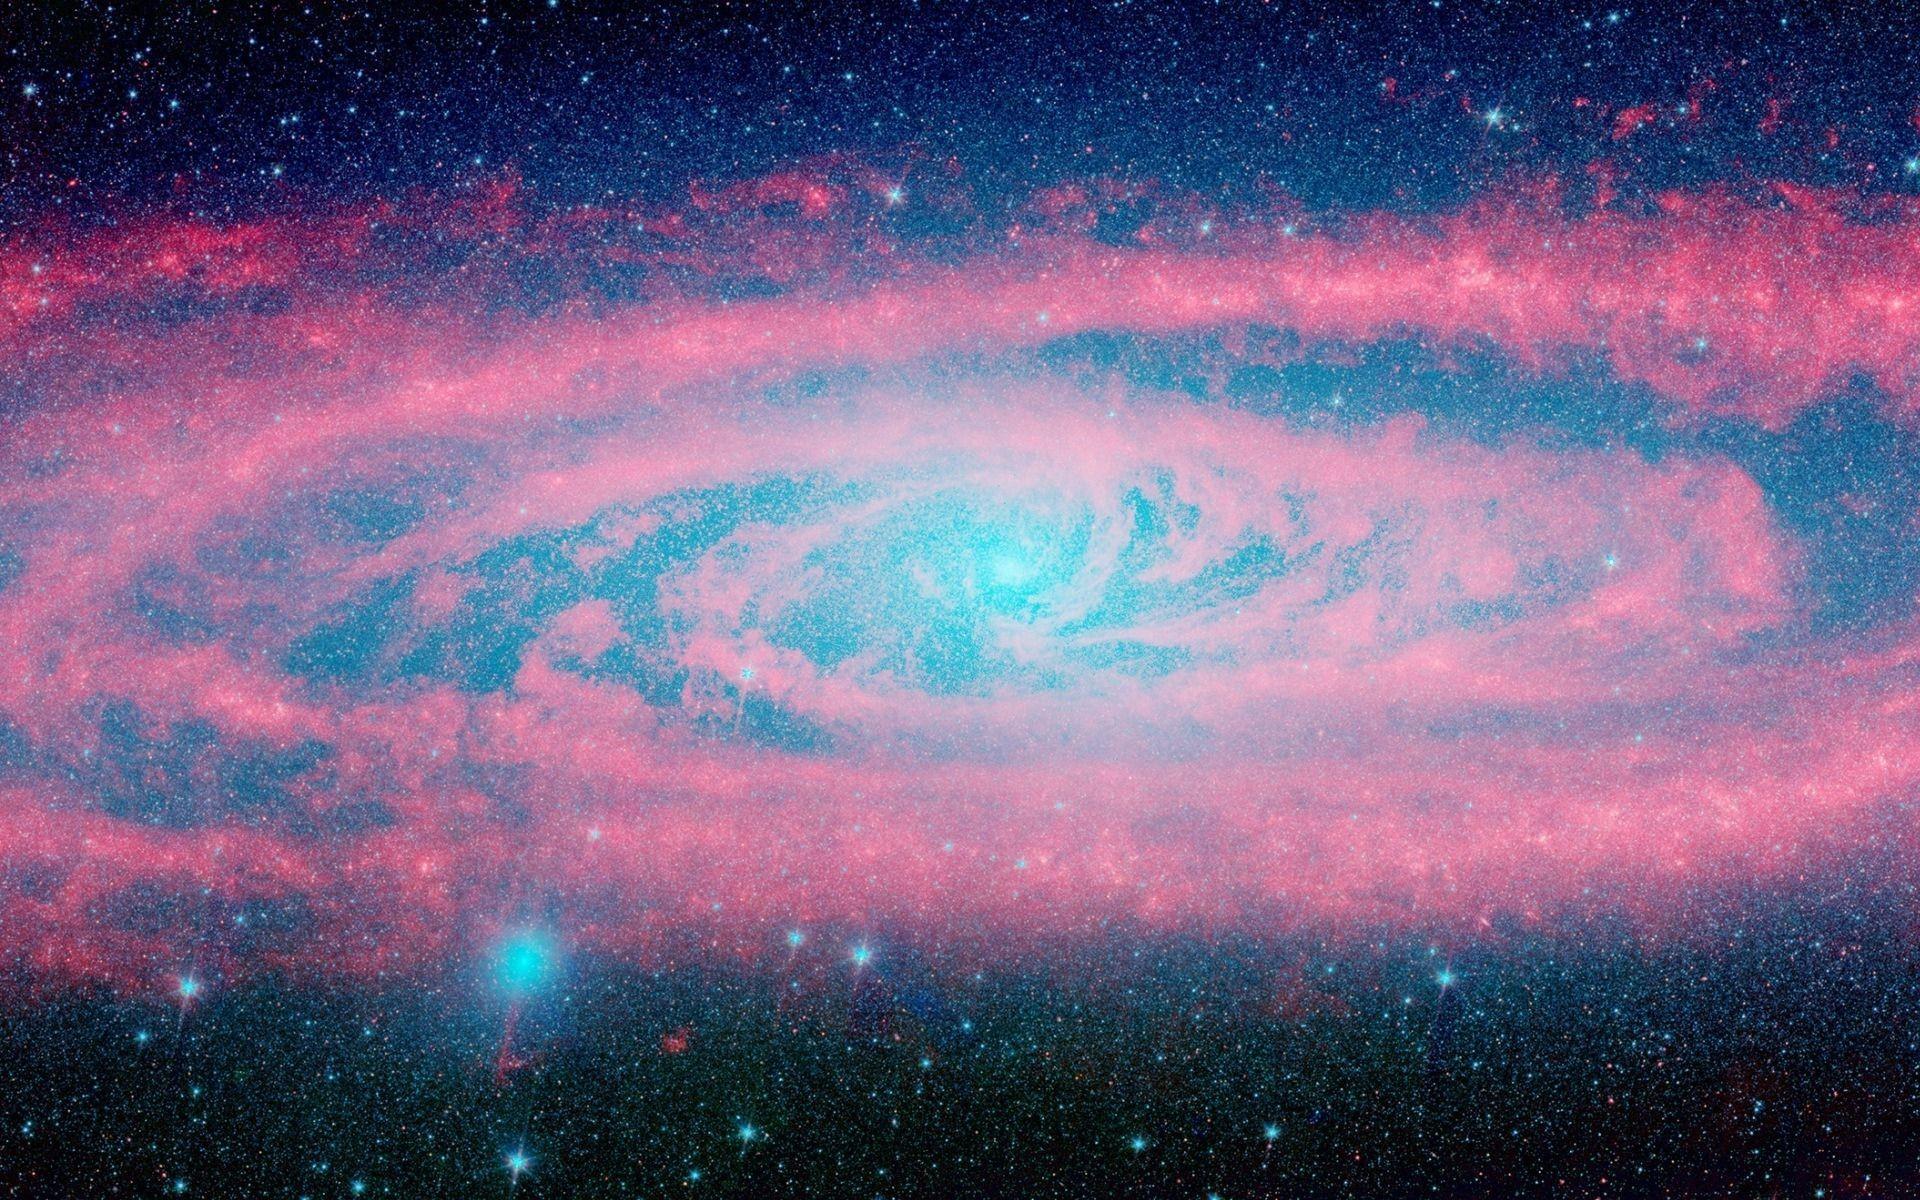 Space Wallpaper Cool Wallpapers Tumblr Wallpapers Cool: Galaxy Wallpaper Tumblr ·① Download Free Beautiful